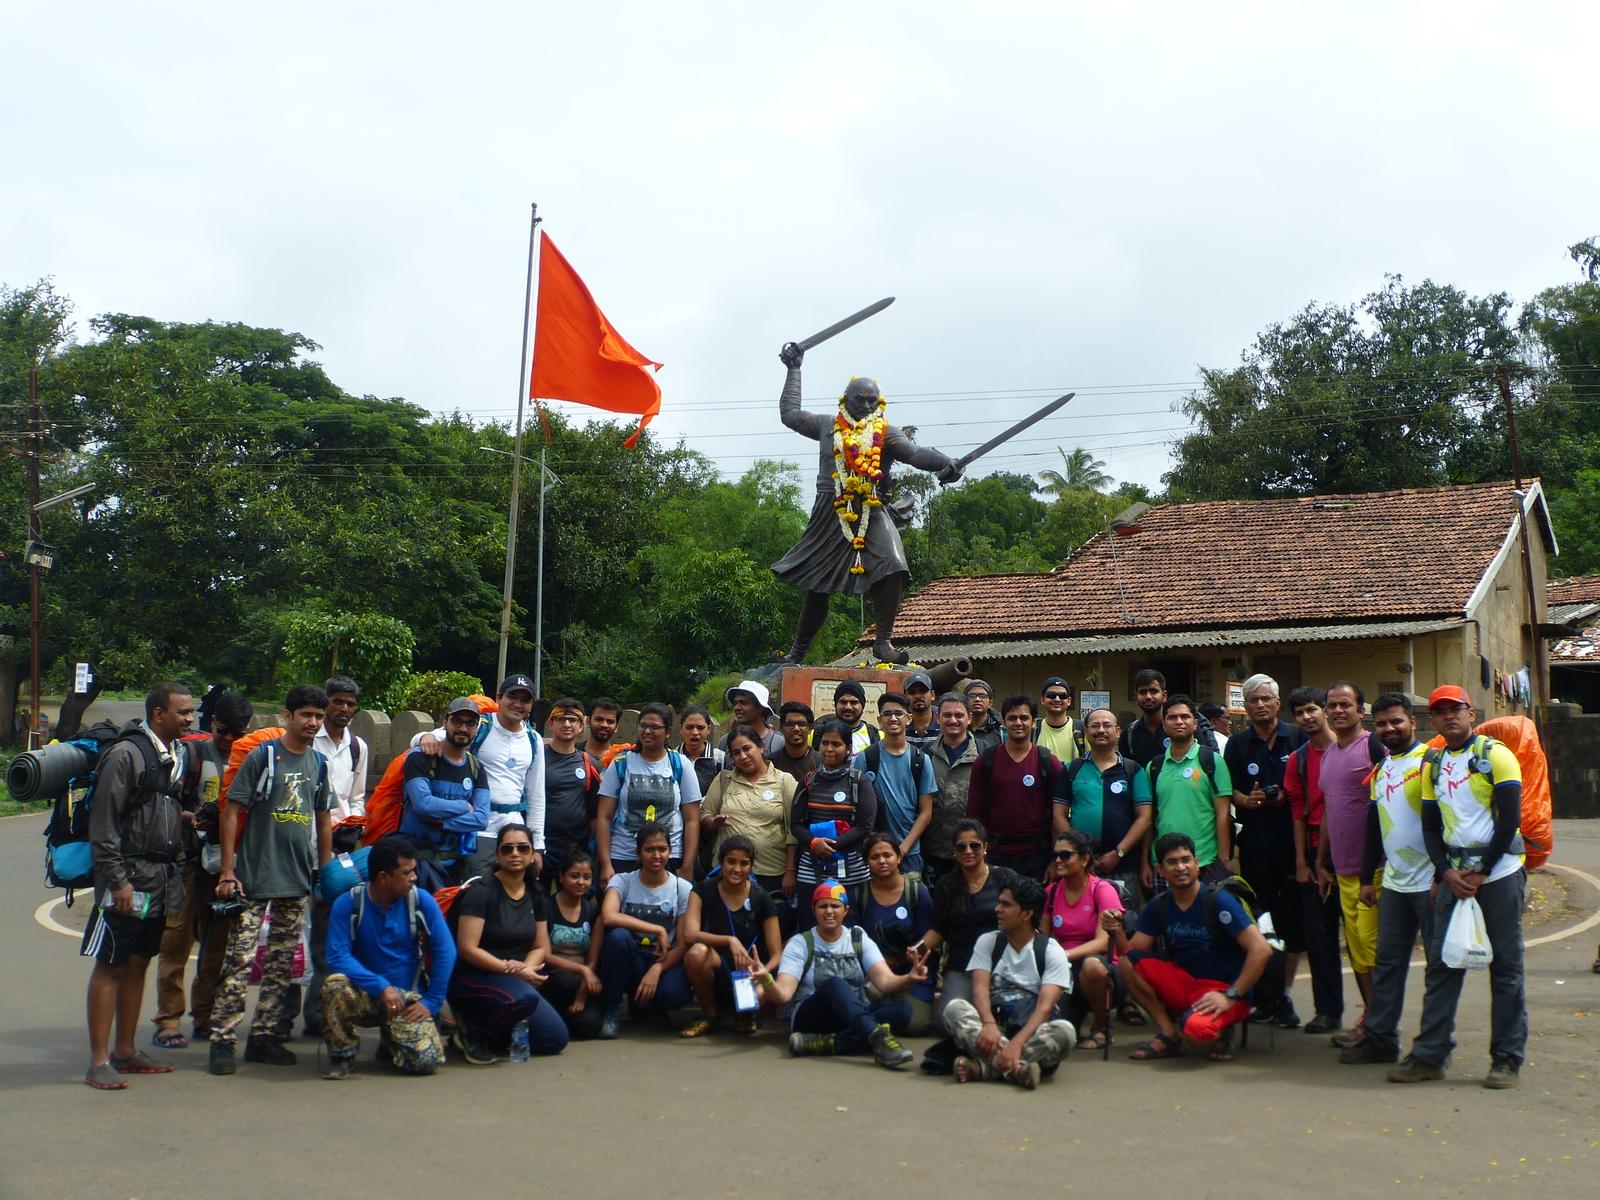 Shikhar Vedh : 9th year Tribute to Great Maratha Warrior Bajiprabhu Deshpande